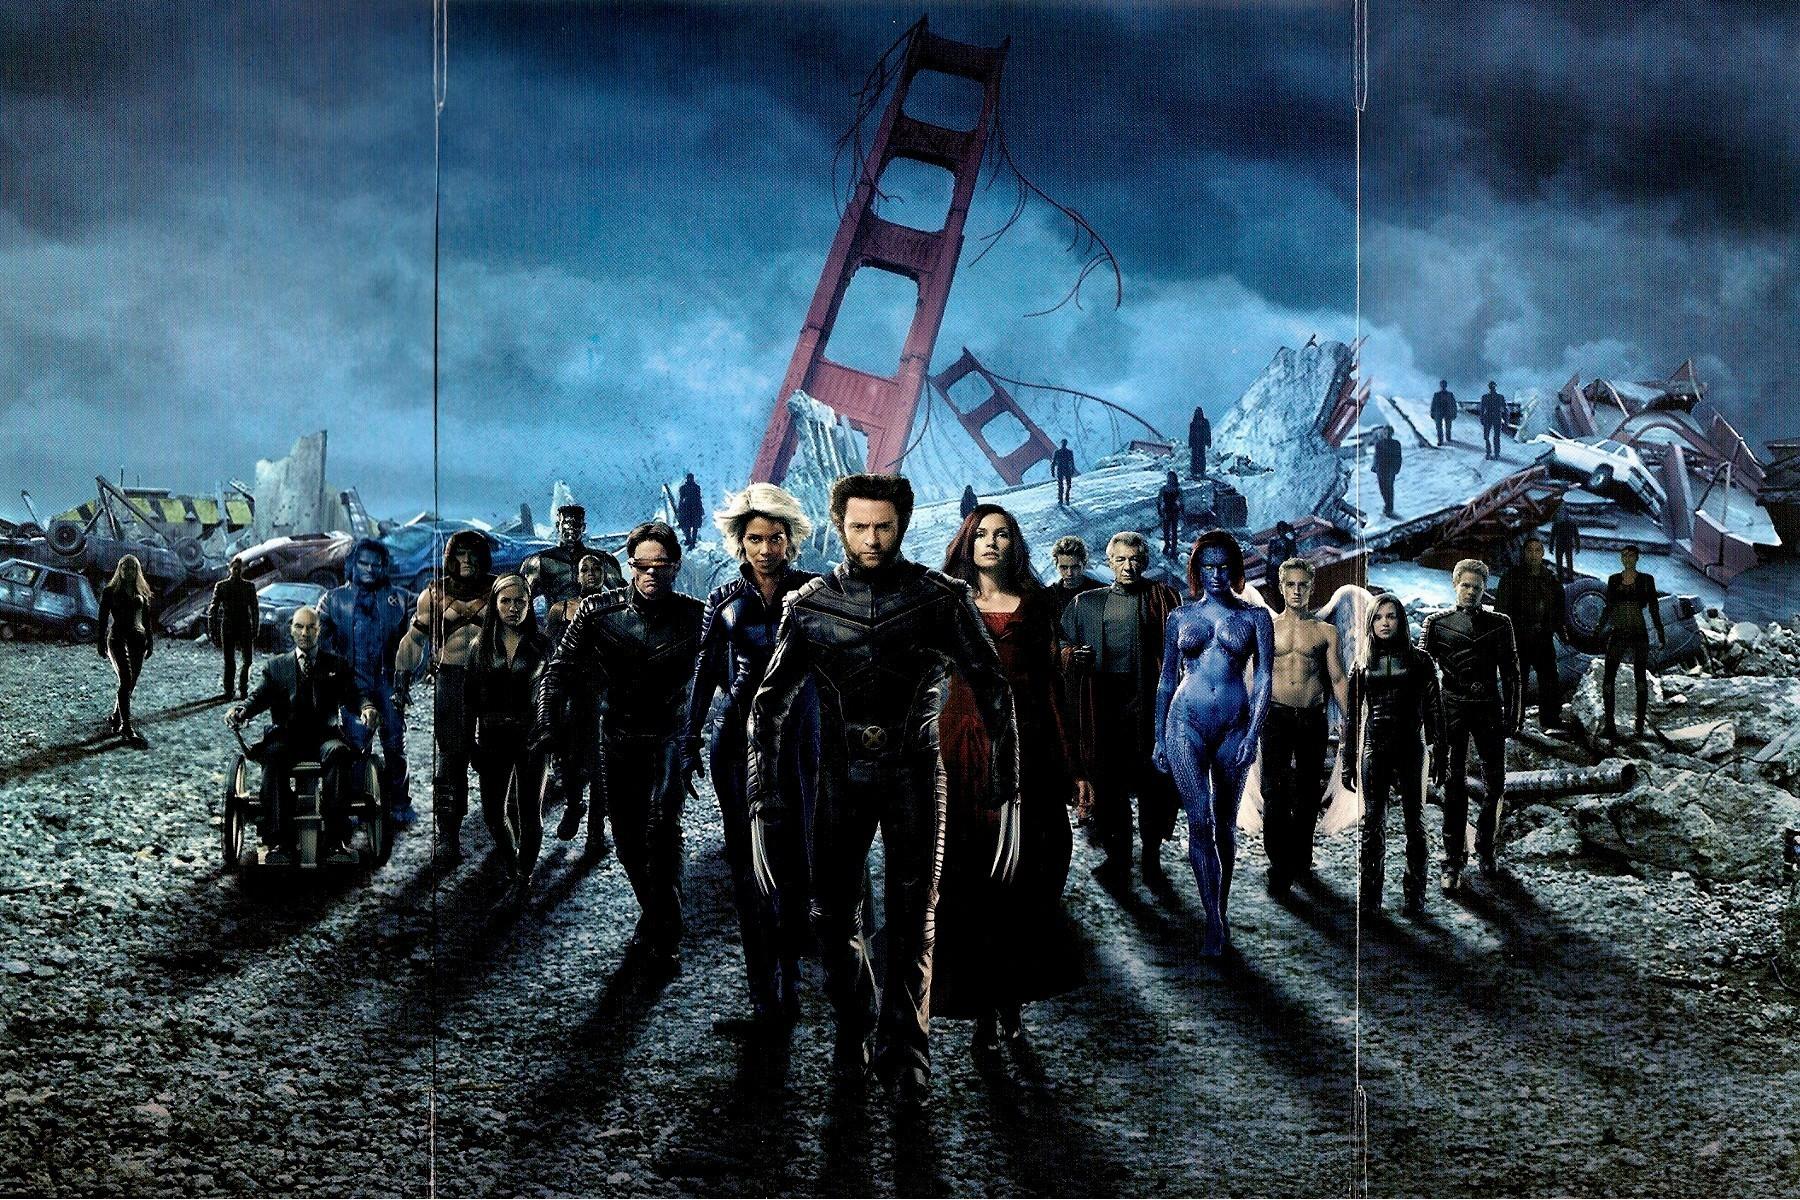 49] X Men Movie Wallpaper on WallpaperSafari 1800x1200